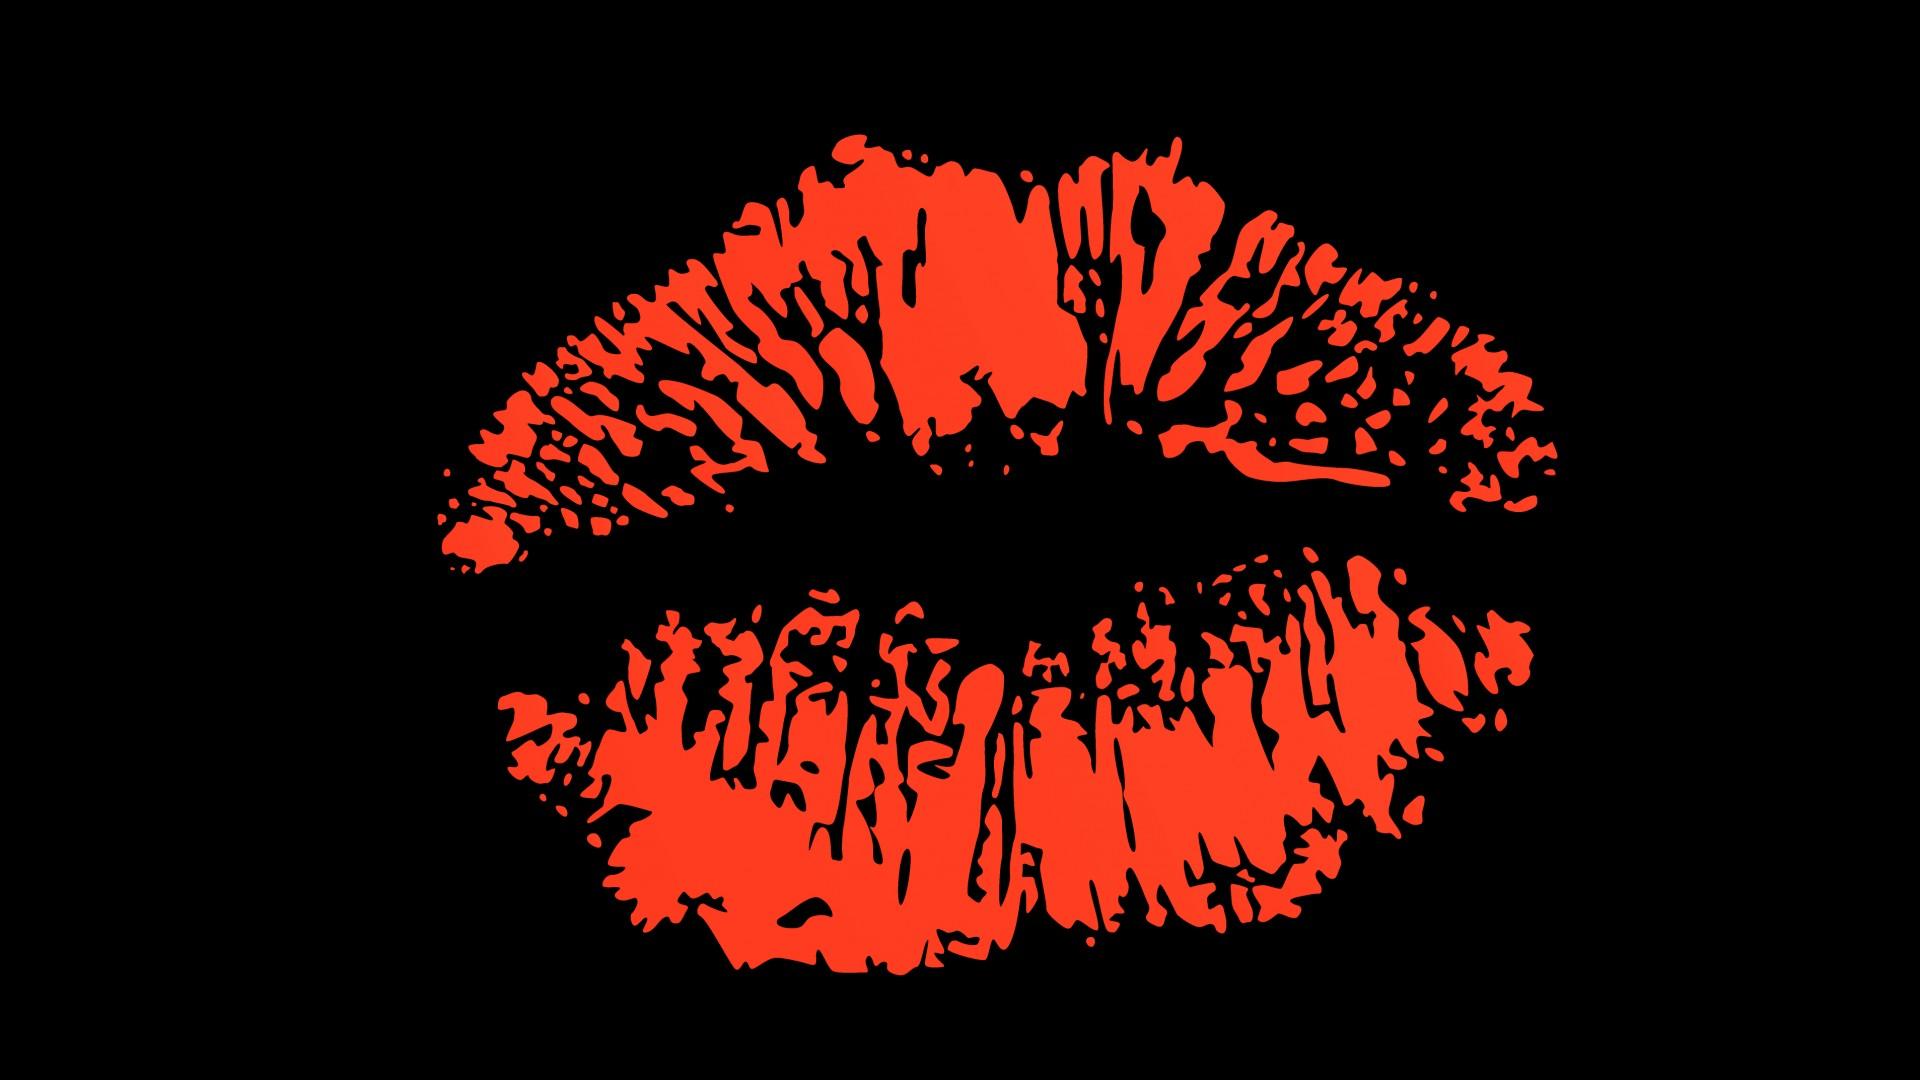 Romantic Love Kiss Pic